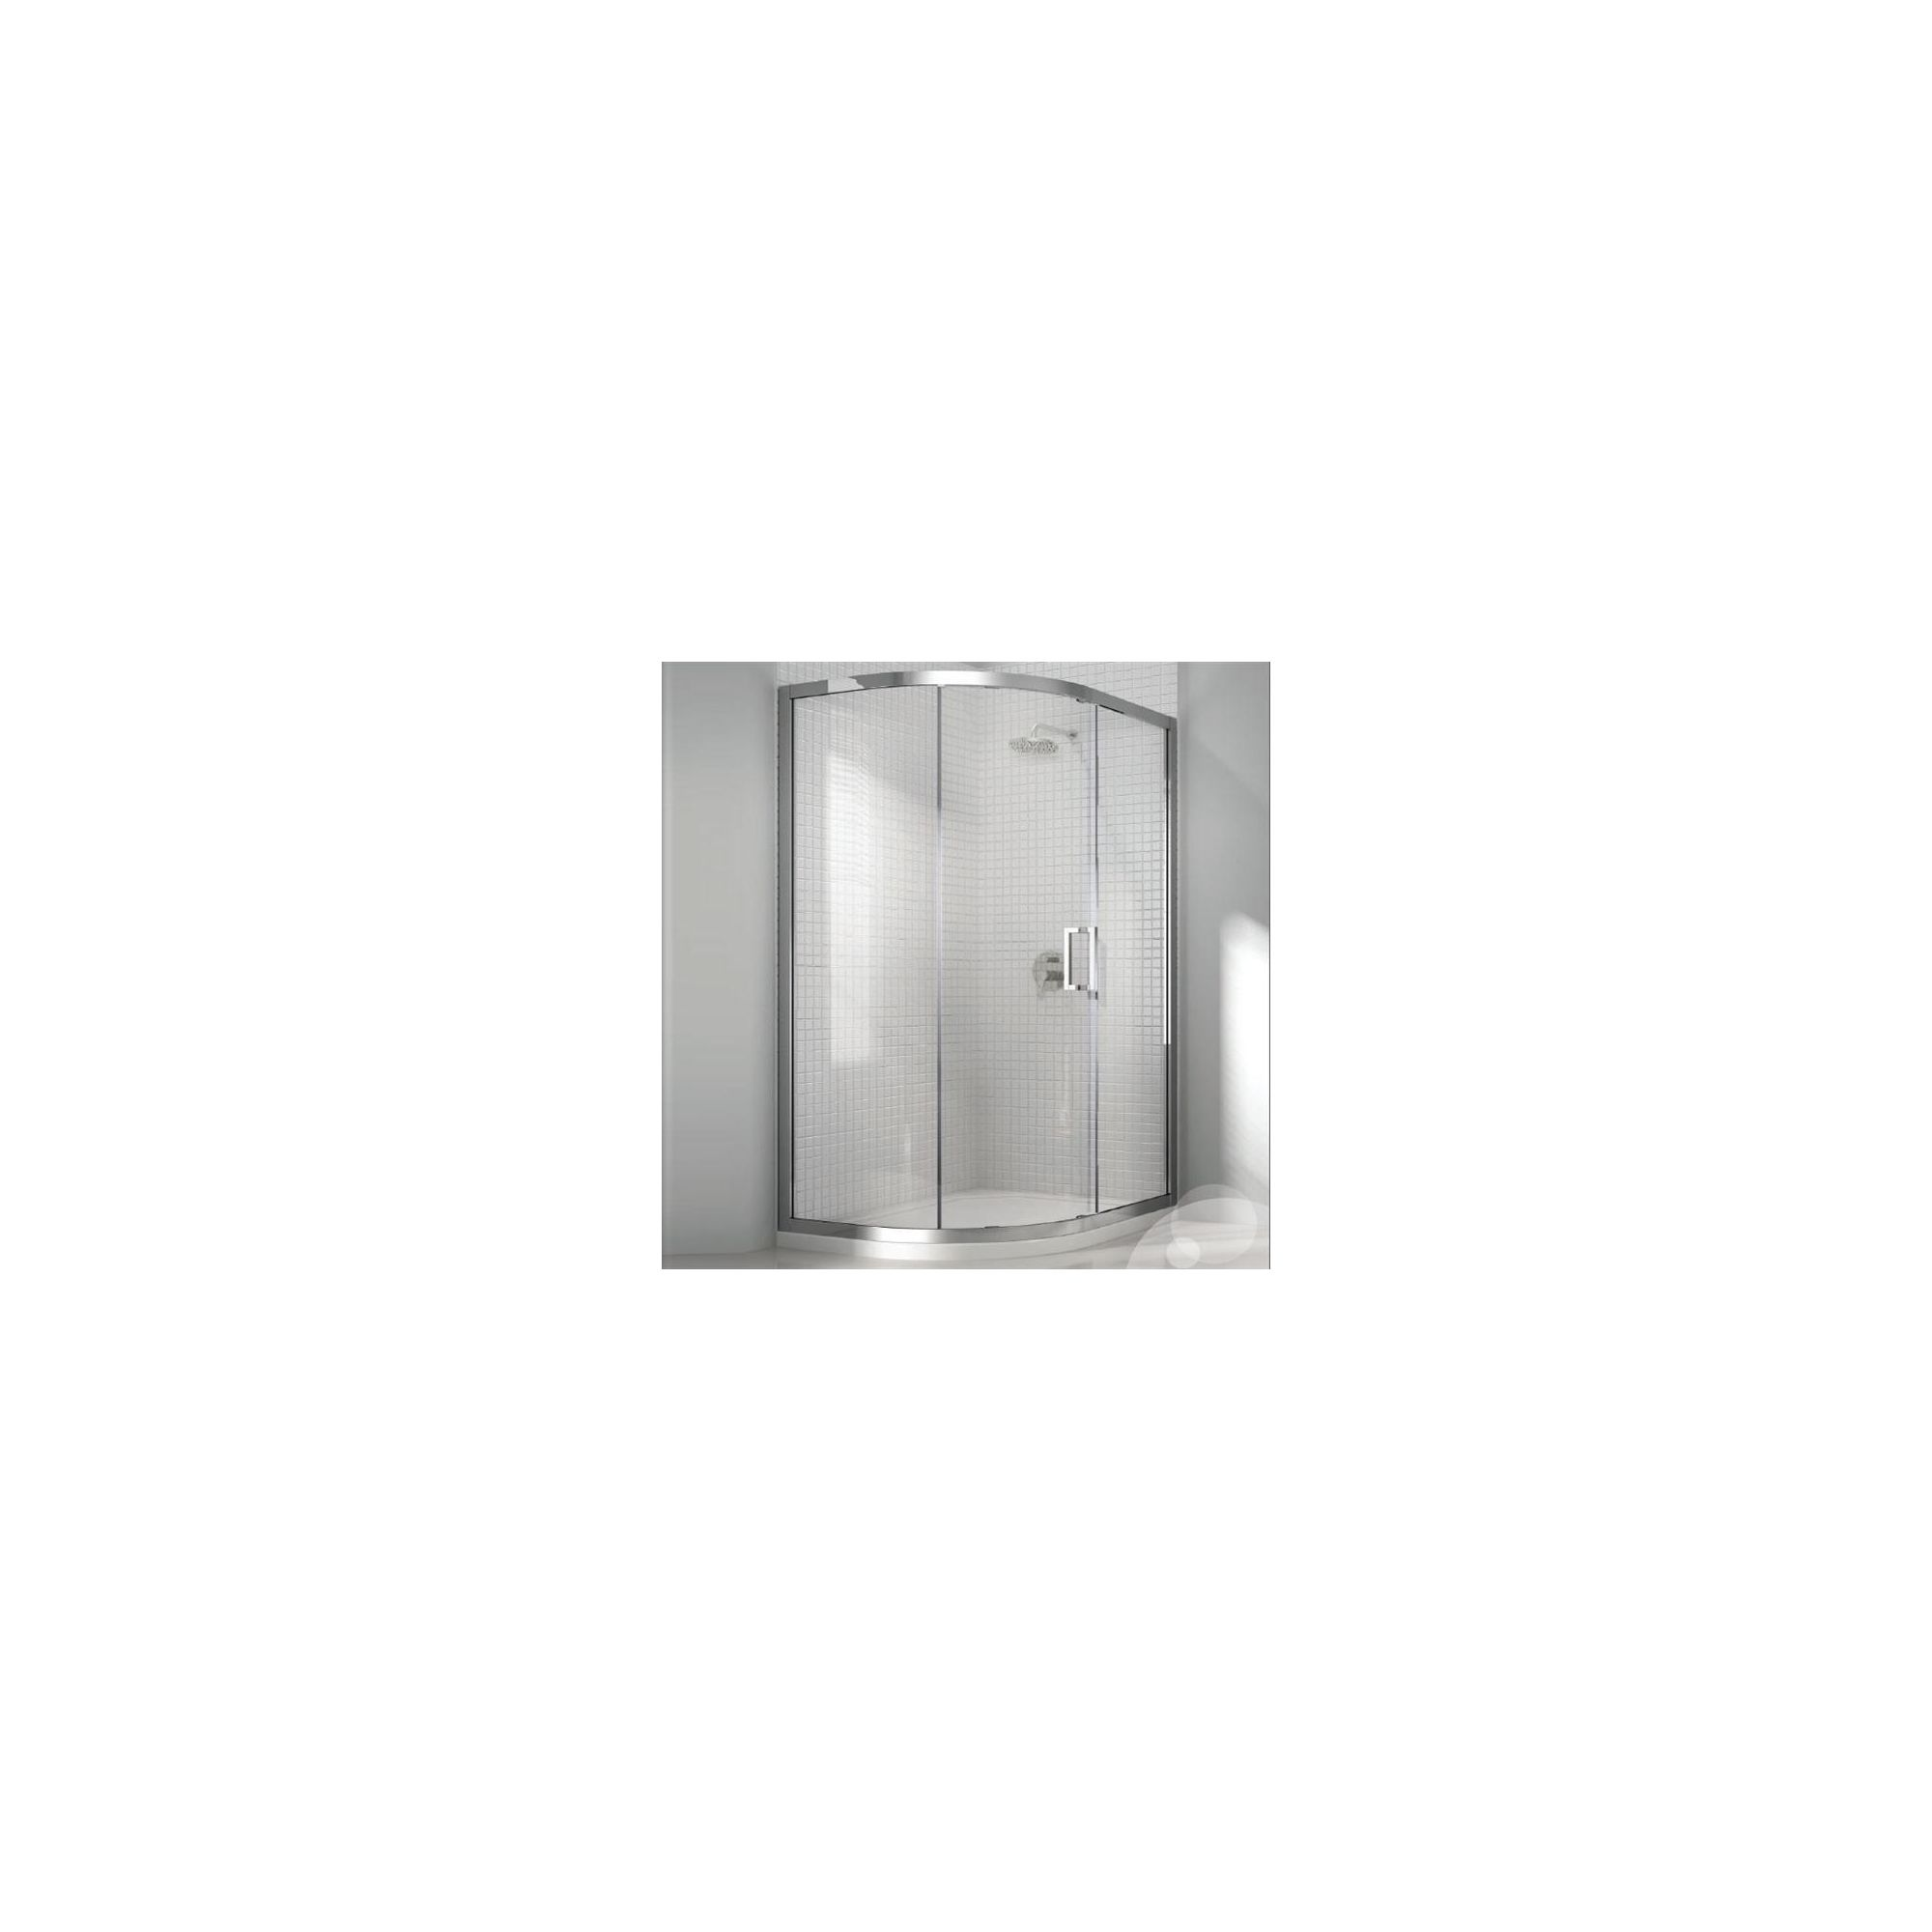 Merlyn Vivid Eight Offset Quadrant Shower Door, 1000mm x 800mm, 8mm Glass at Tescos Direct